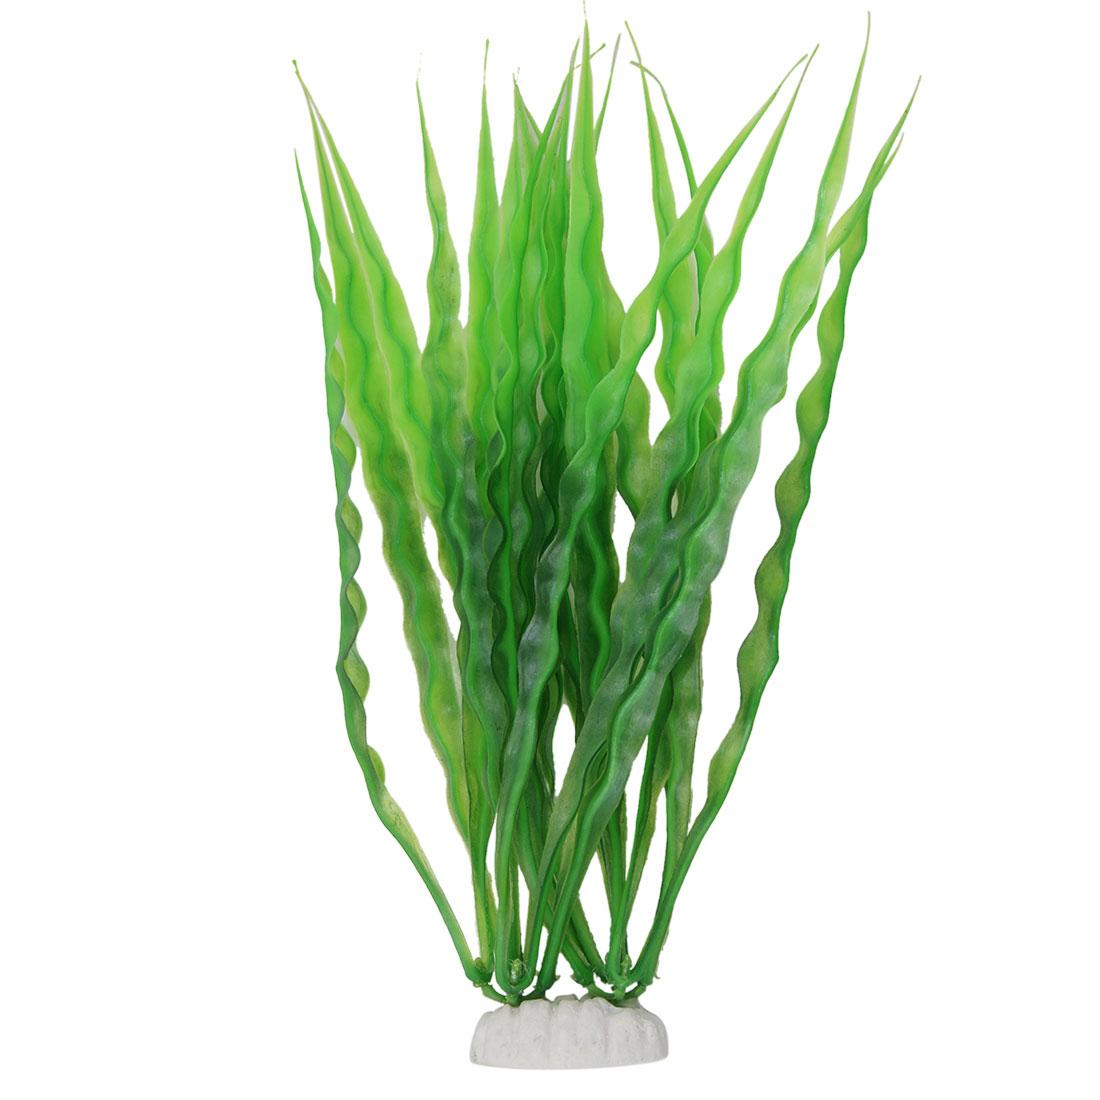 Fish Tank Plastic Long Grass Green Decoration Ornament